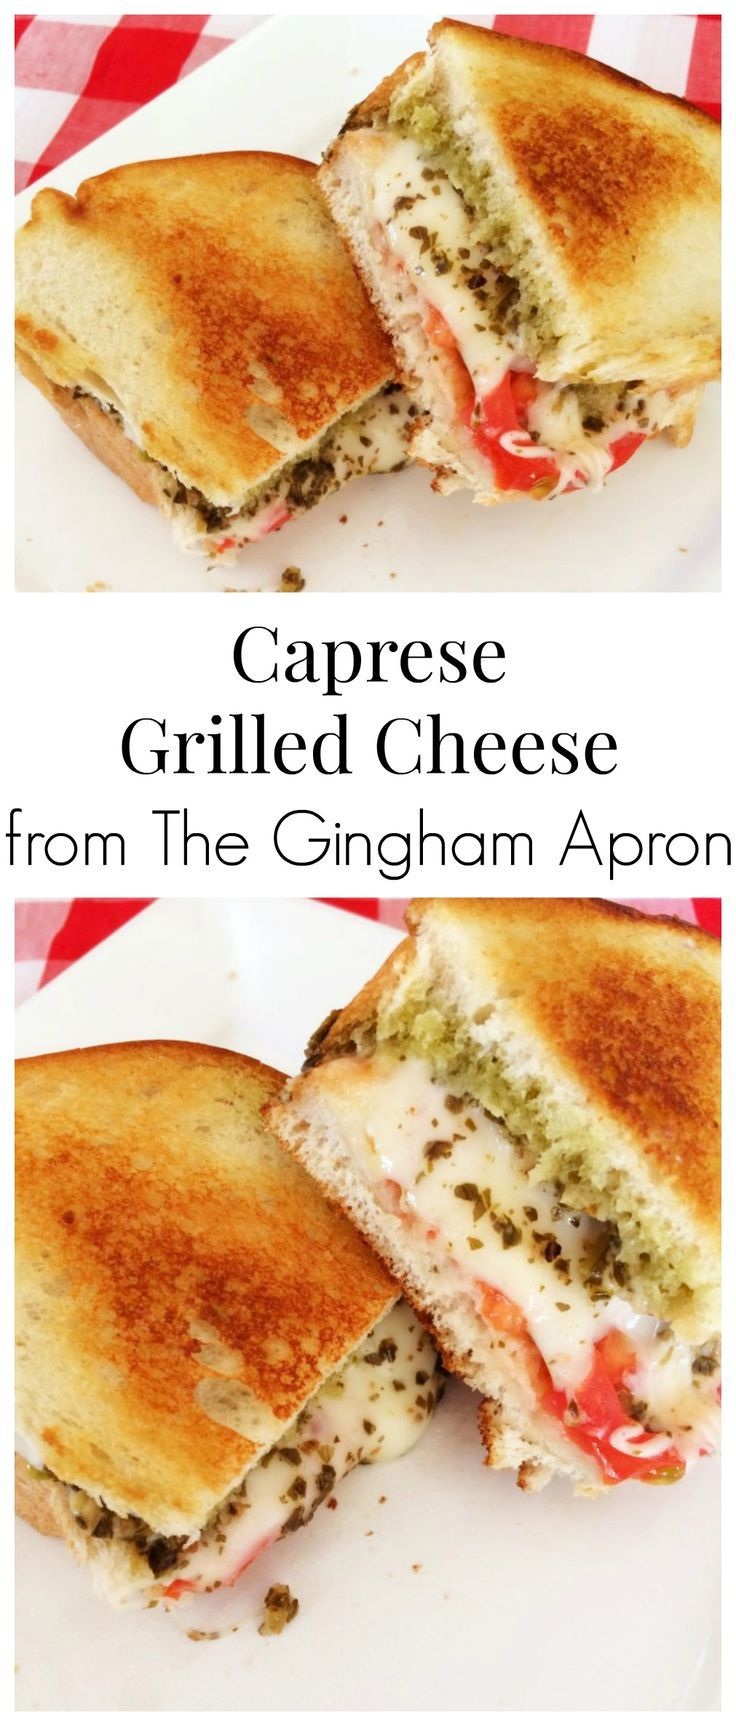 Caprese Grilled Cheese- melty mozzerella, pesto, and tomato sandwich...YUMMMM